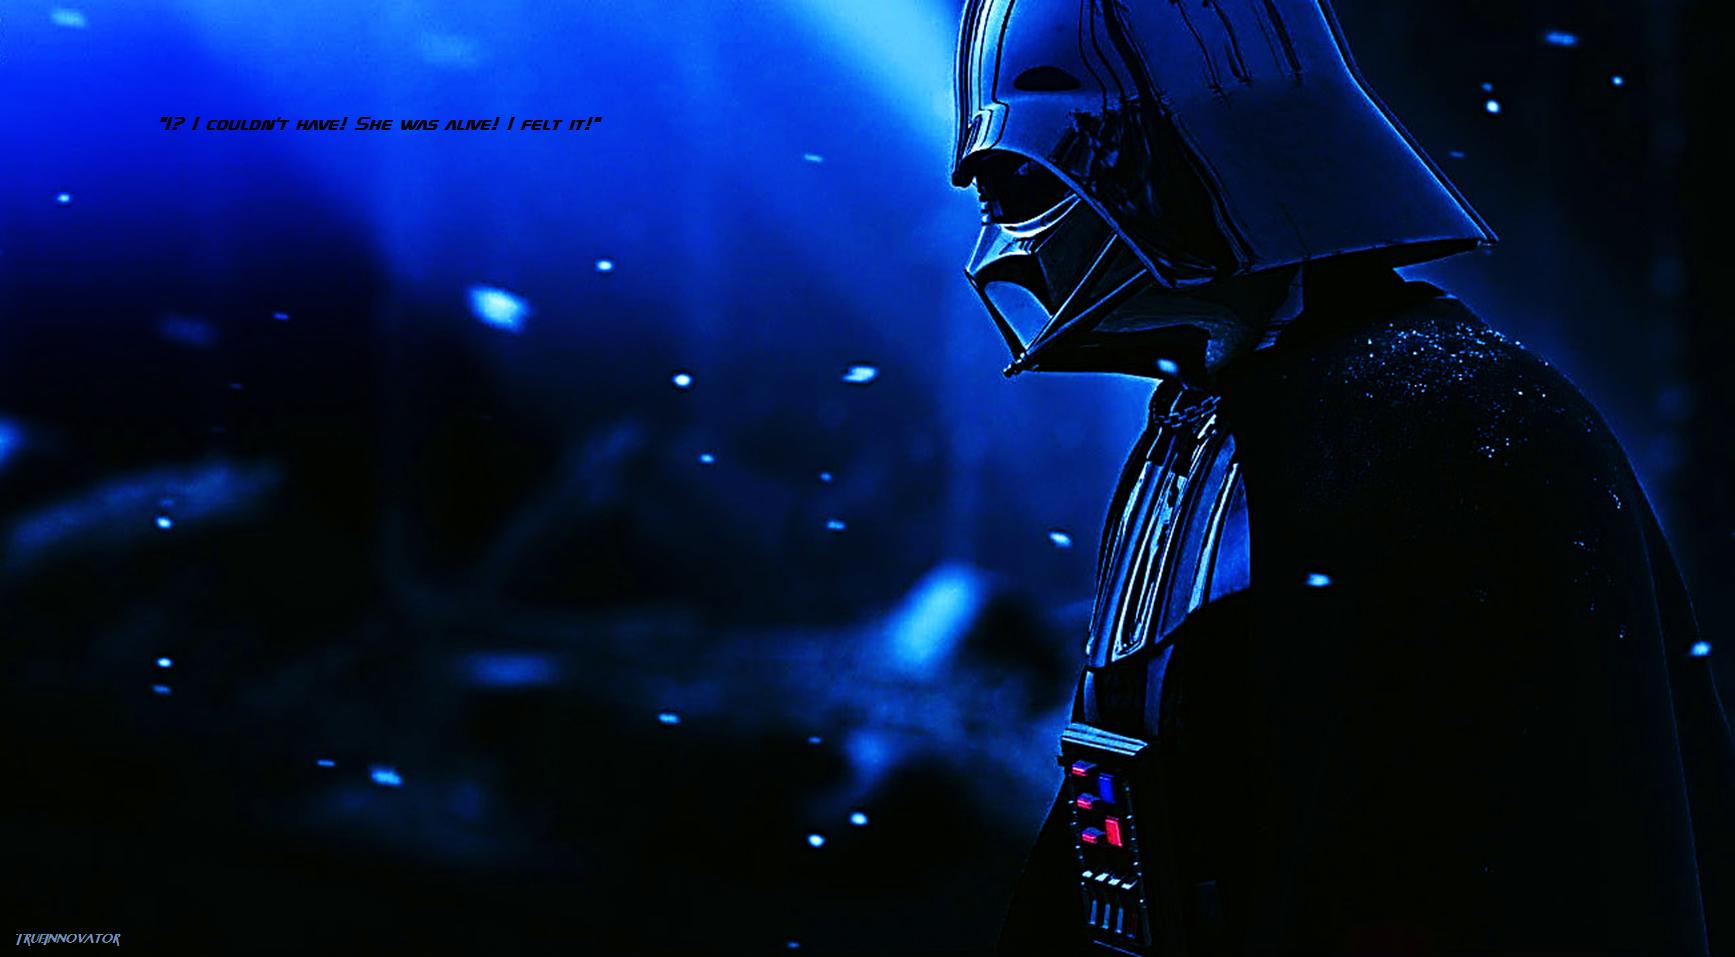 Darth Vader Mourns Wallpaper by TrueInnovator159 1735x957